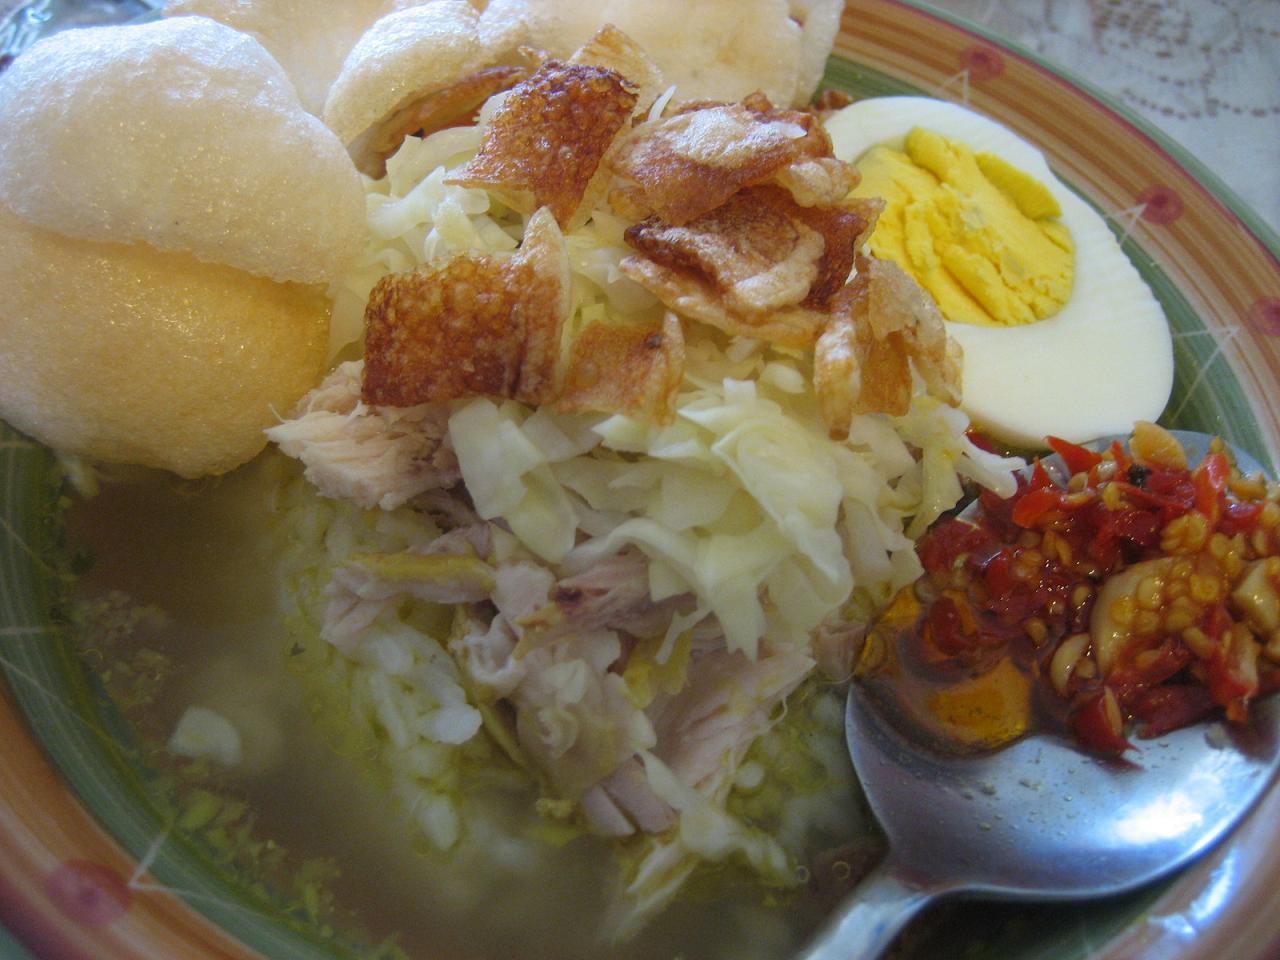 Resep soto ayam resep cara membuat soto ayam lamongan